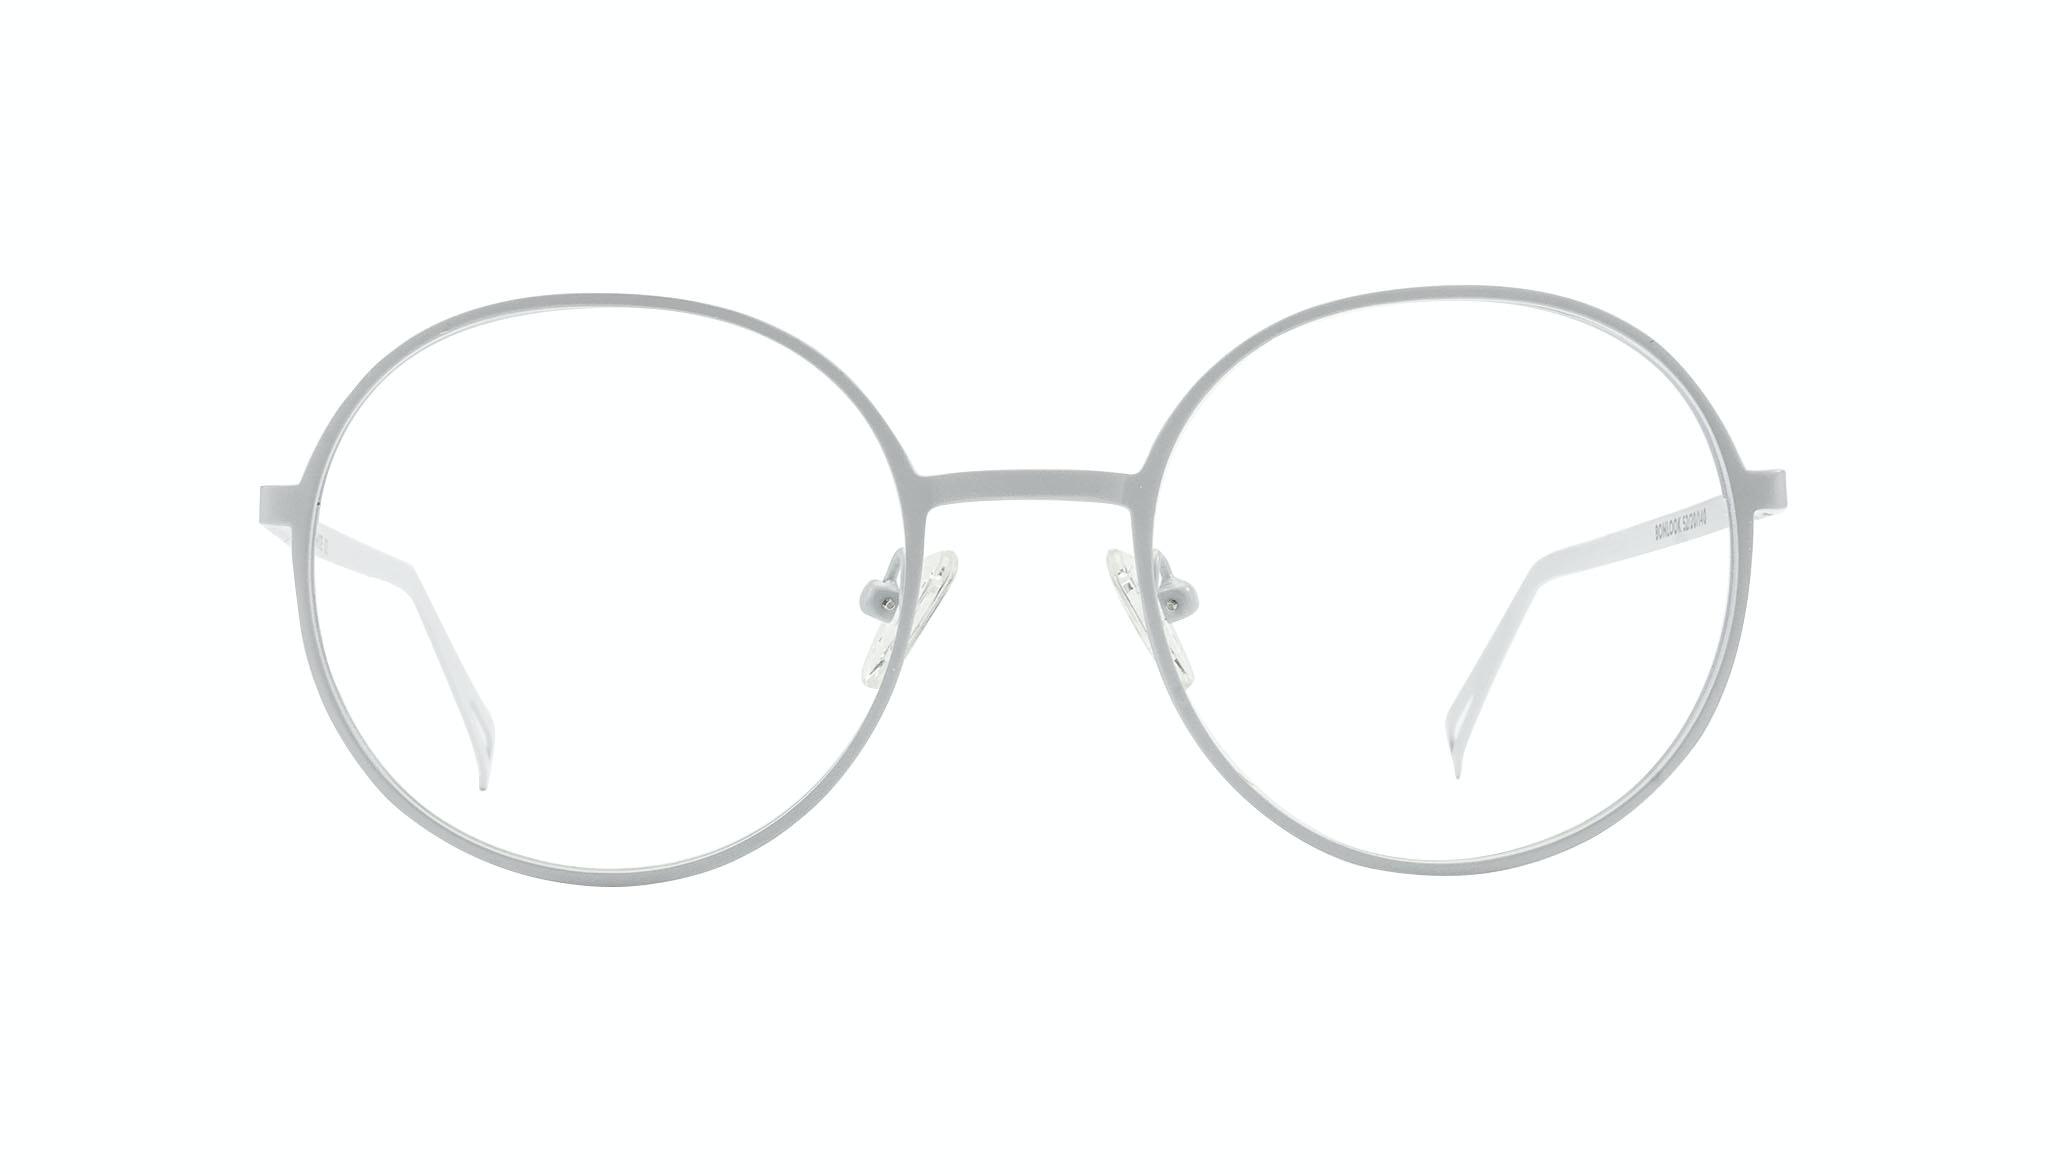 Affordable Fashion Glasses Round Eyeglasses Men Women Varna White Front